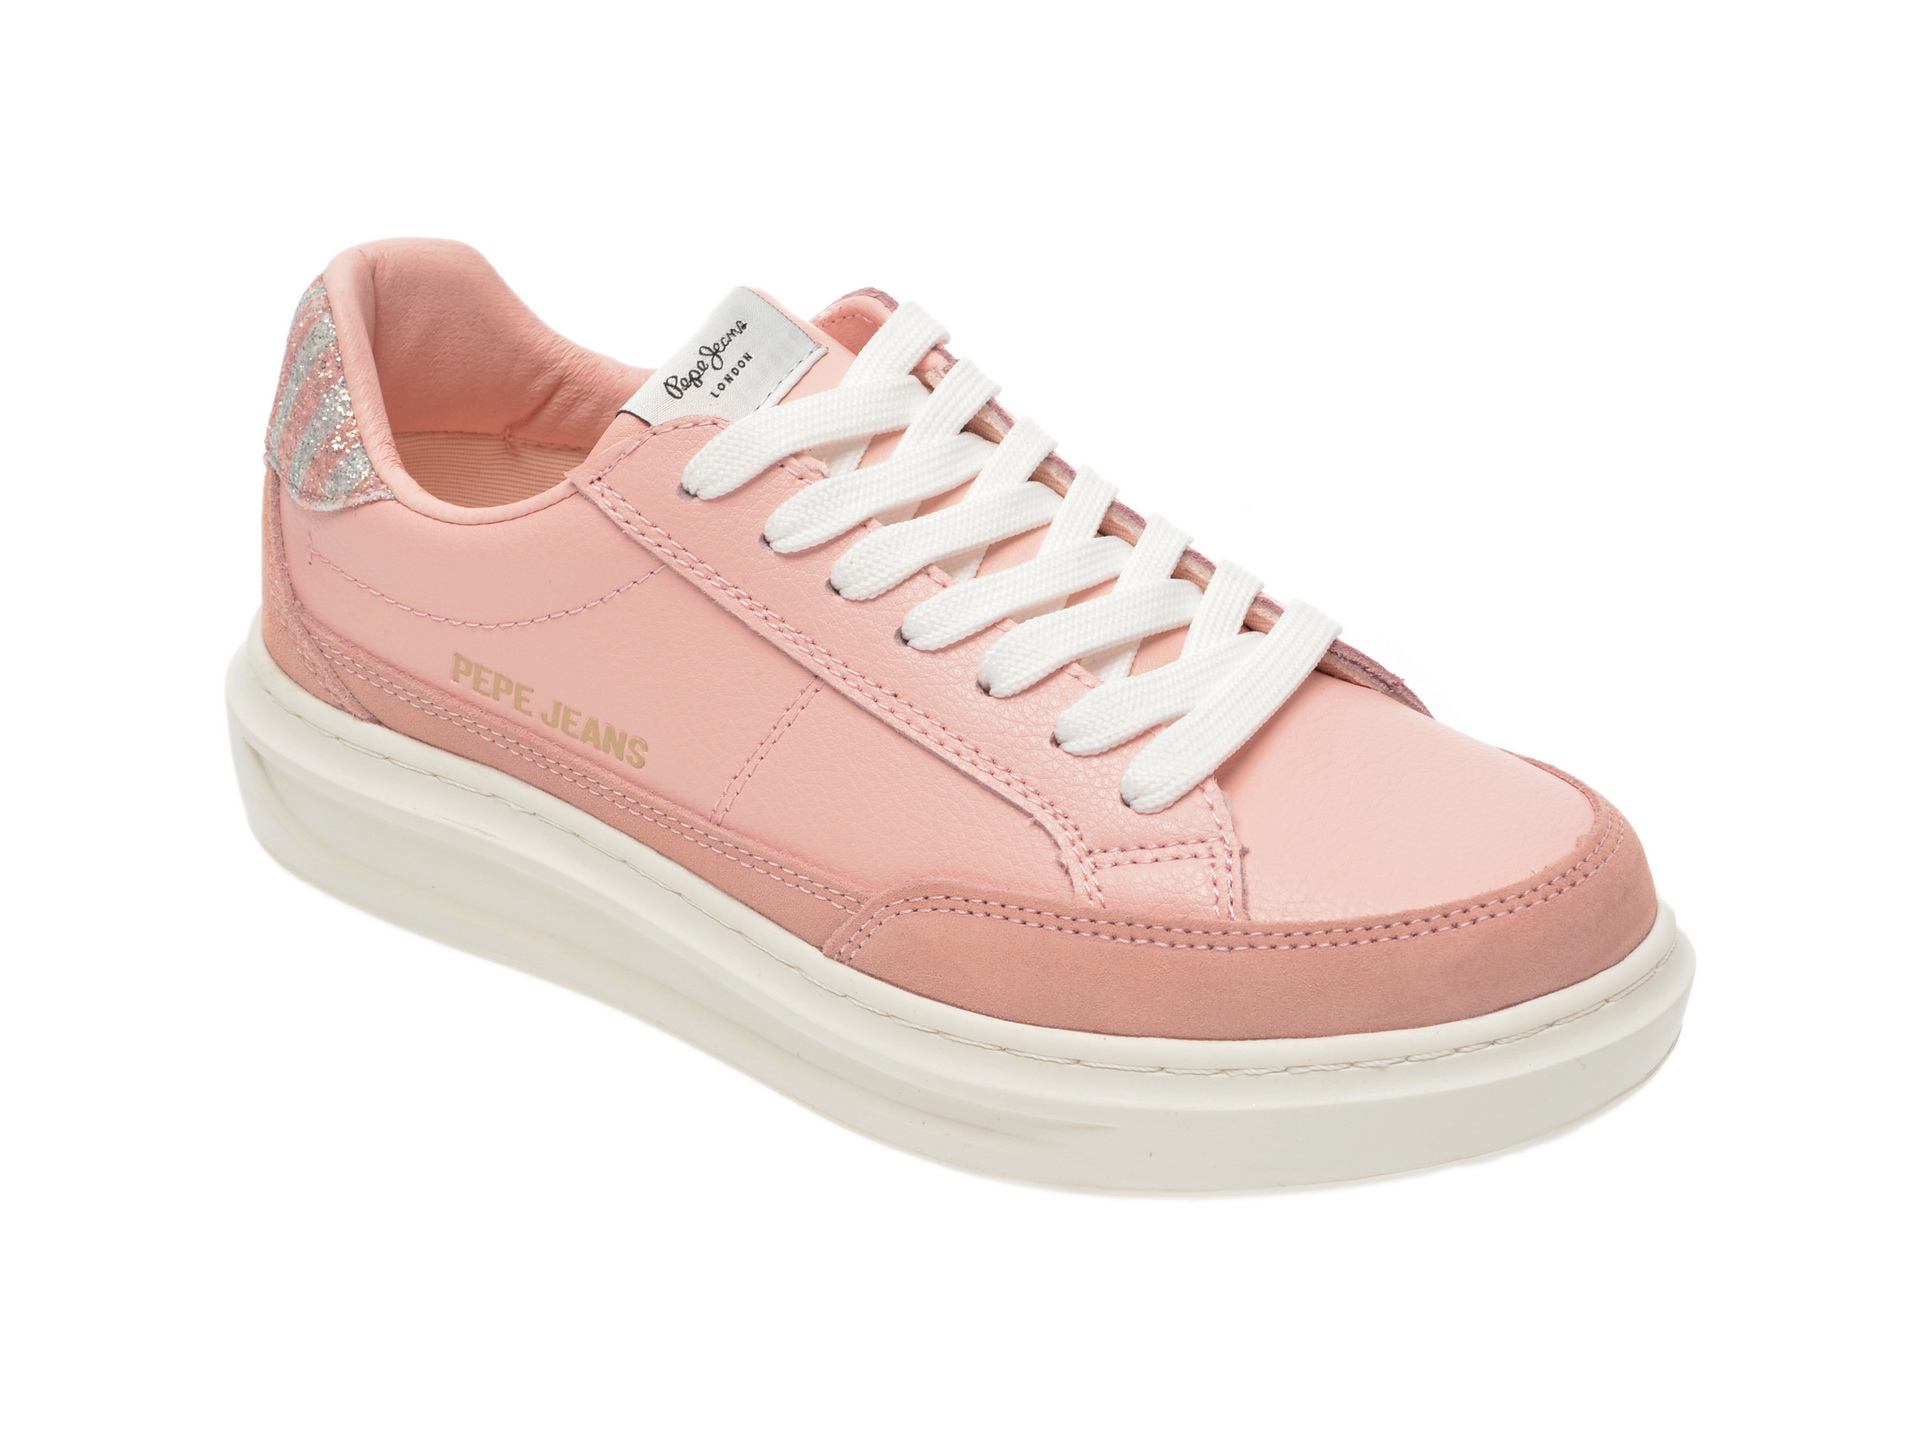 Pantofi sport PEPE JEANS roz, LS30964, din piele naturala imagine